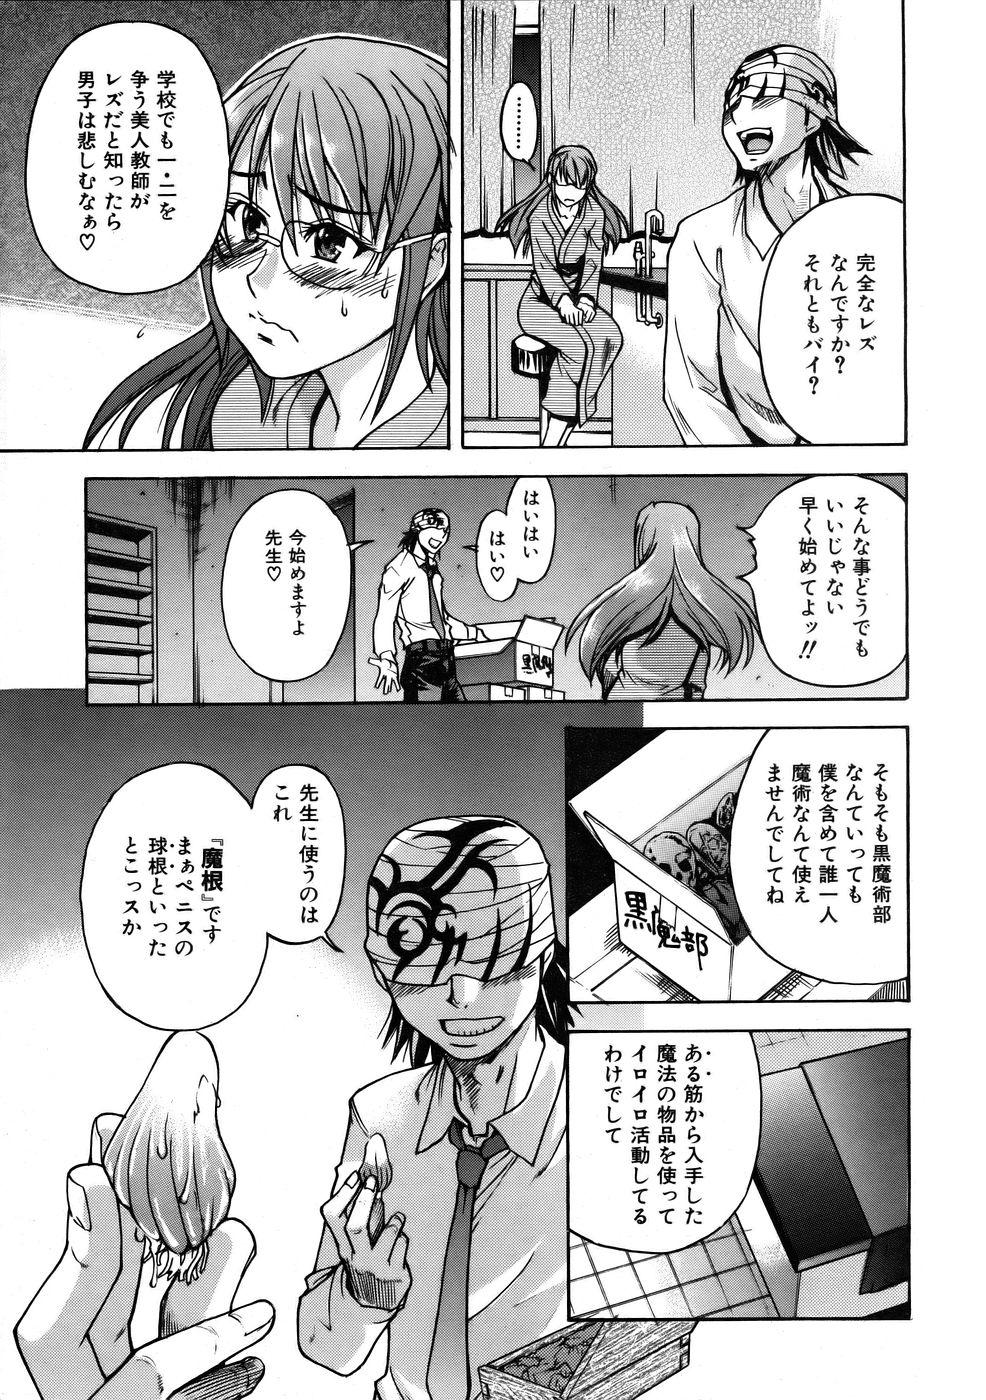 COMIC AUN 2005-10 Vol. 113 18